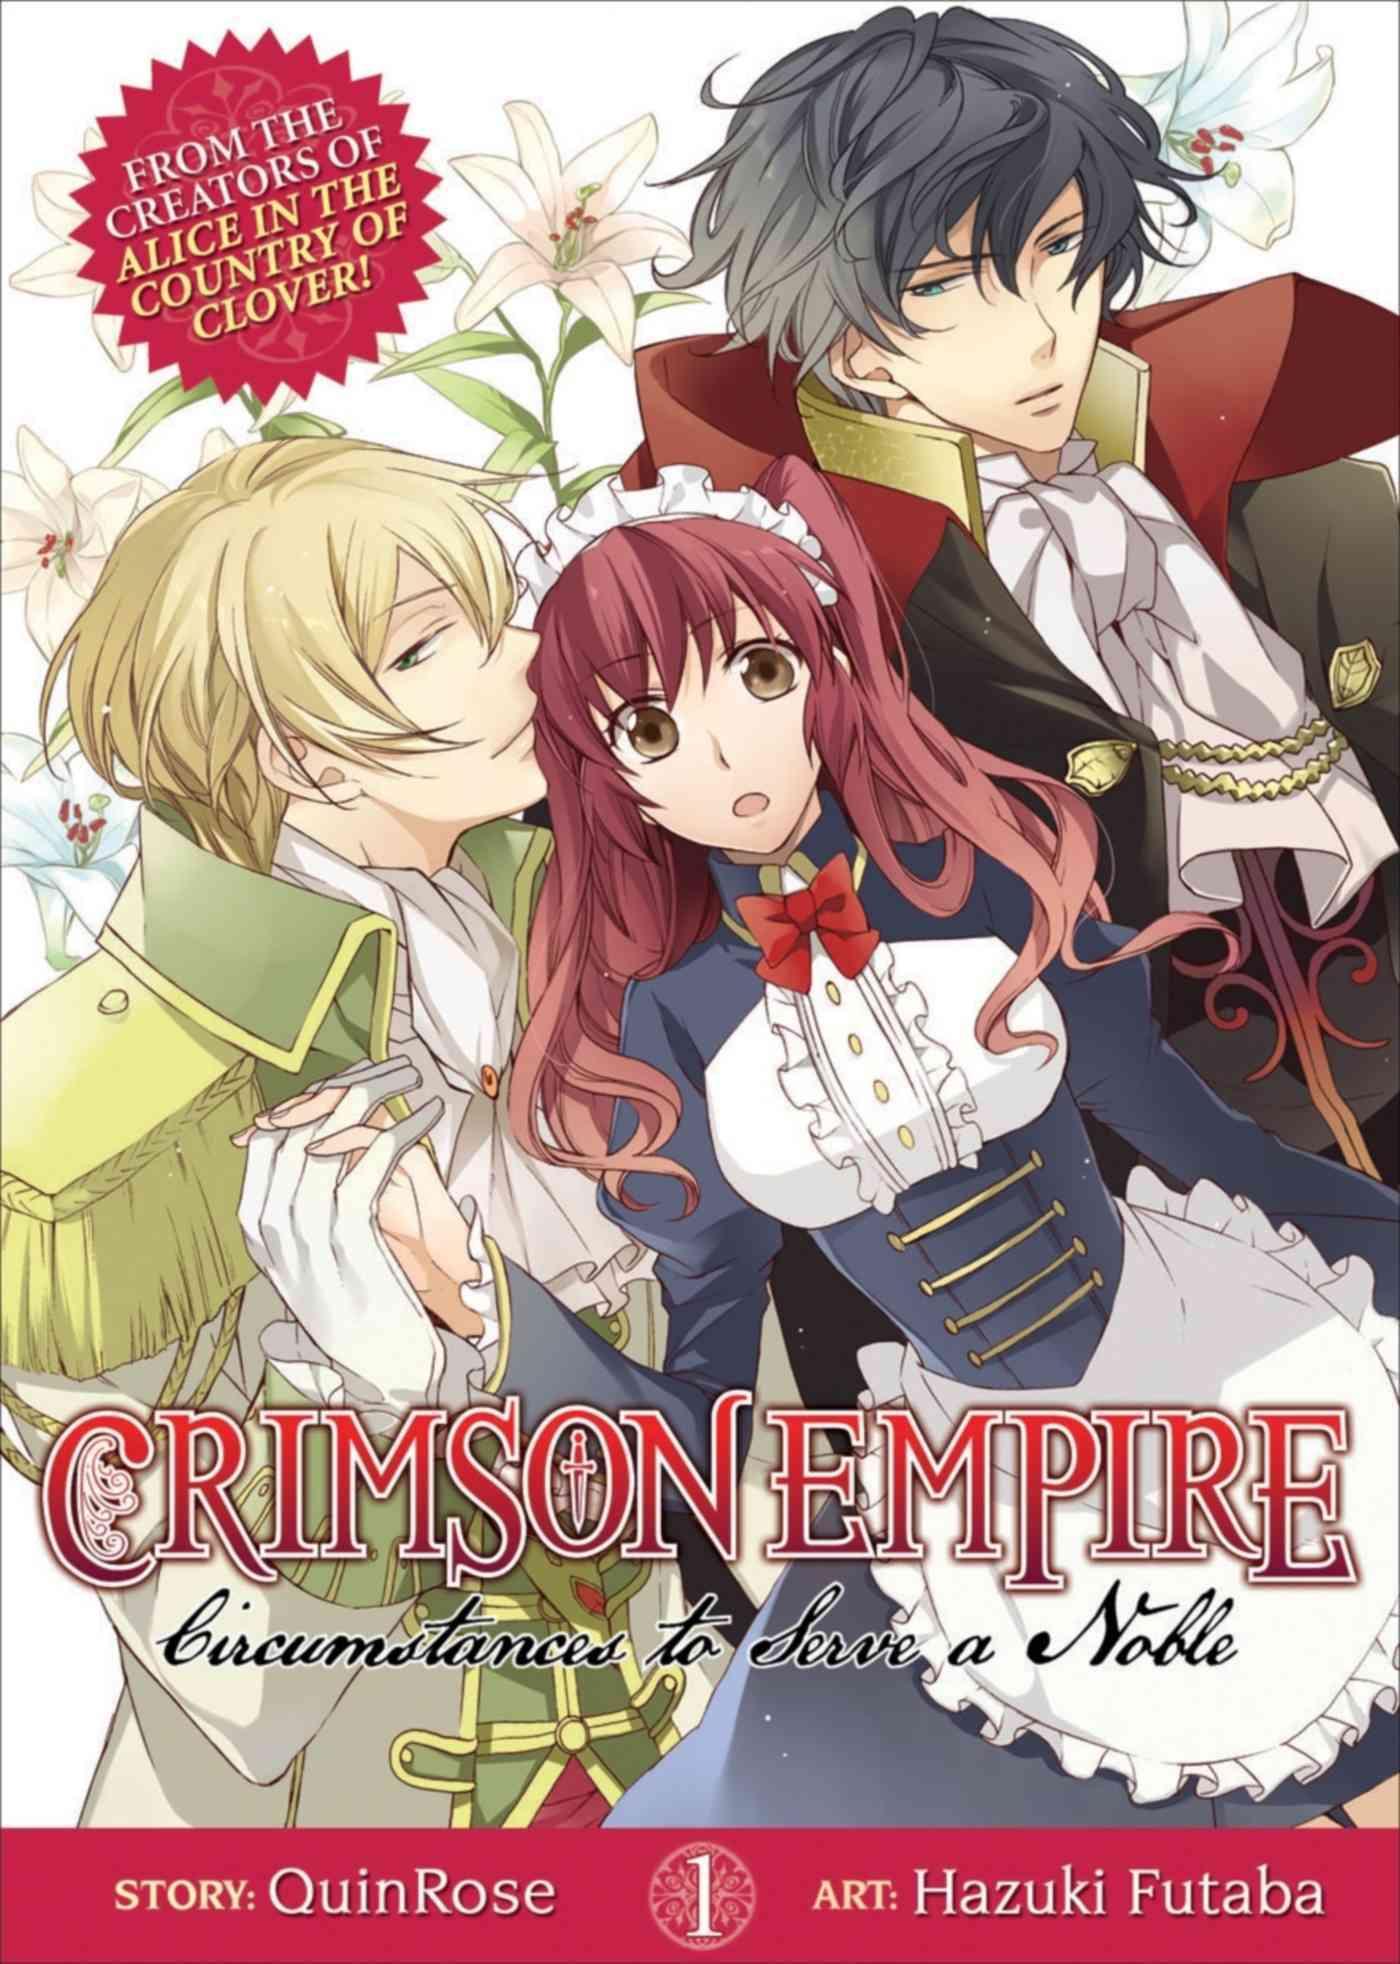 Crimson Empire 1: Circumstances to Serve a Noble (Paperback)